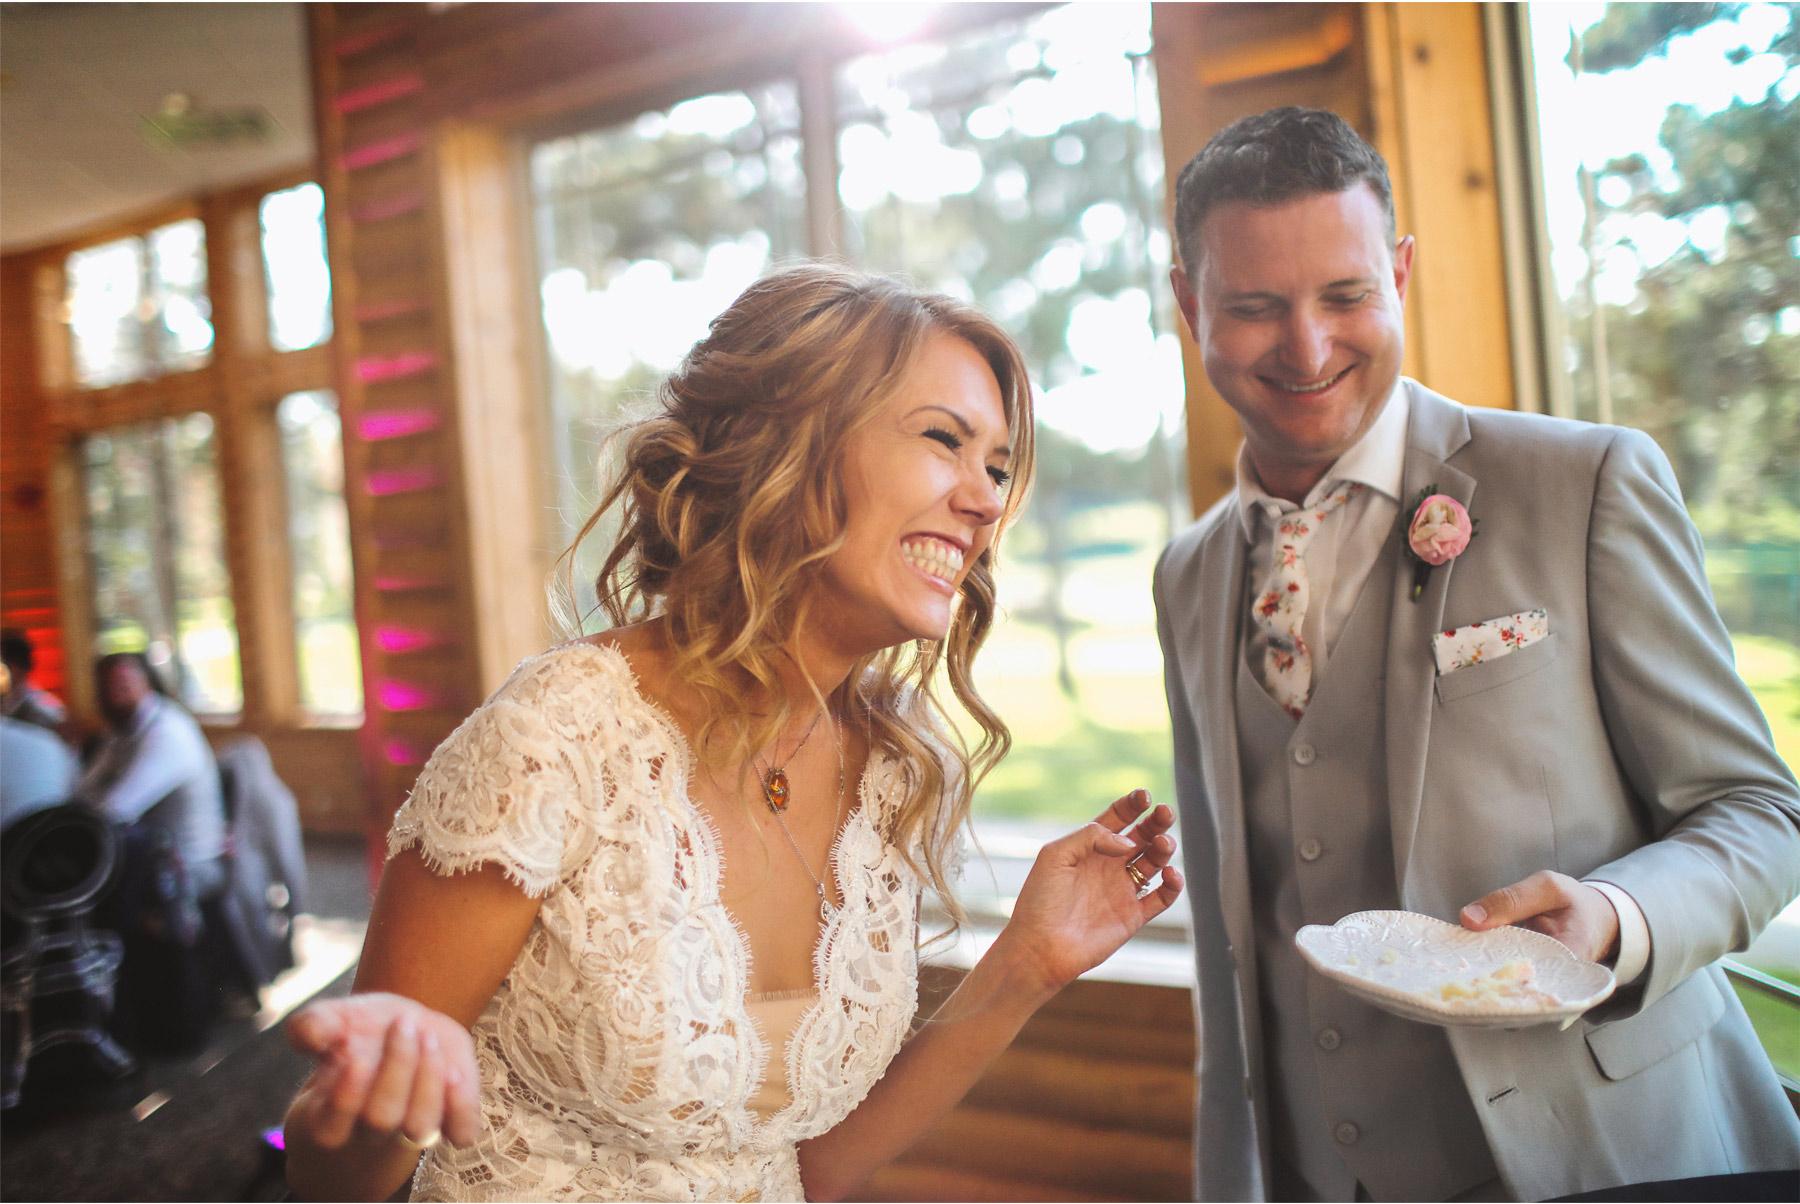 23-Vick-Photography-Wedding-Ottertail-Minnesota-Alice-in-Wonderland-Theme-Reception-Cake-Cutting-Bride-Groom-Rabit-Tess-and-Greg.jpg